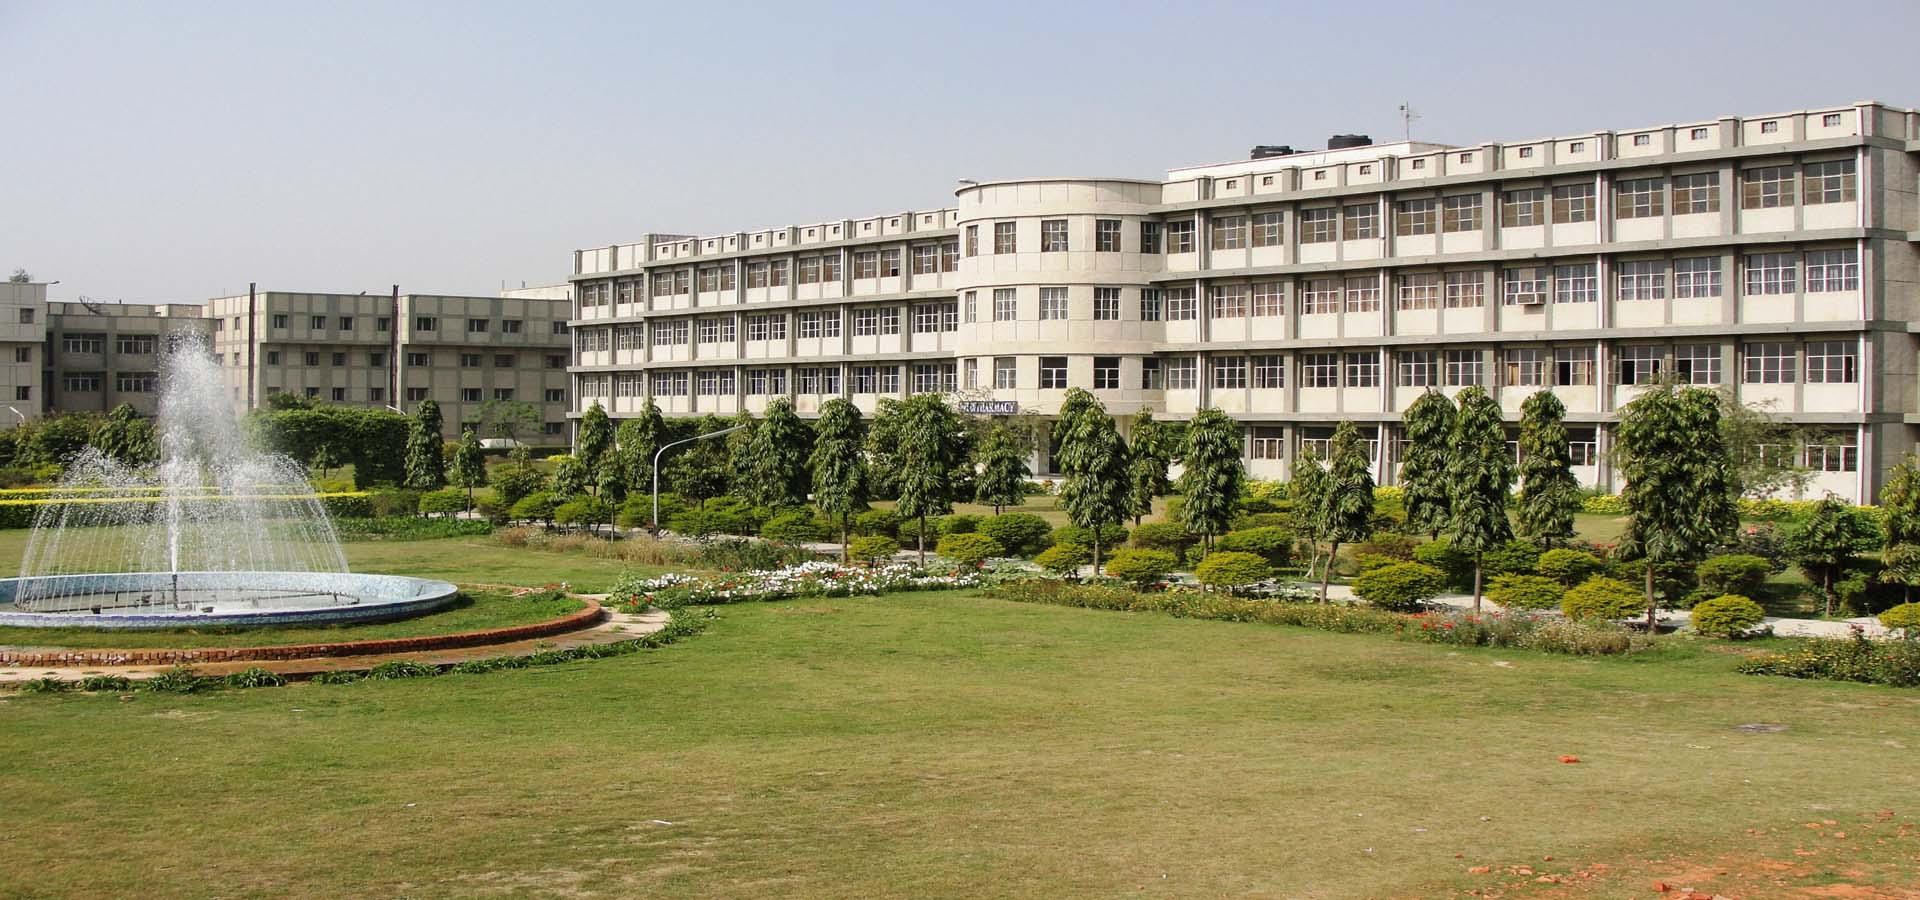 Ram-Eesh Institute Of Vocational And Technical Education, Gautam Budh Nagar